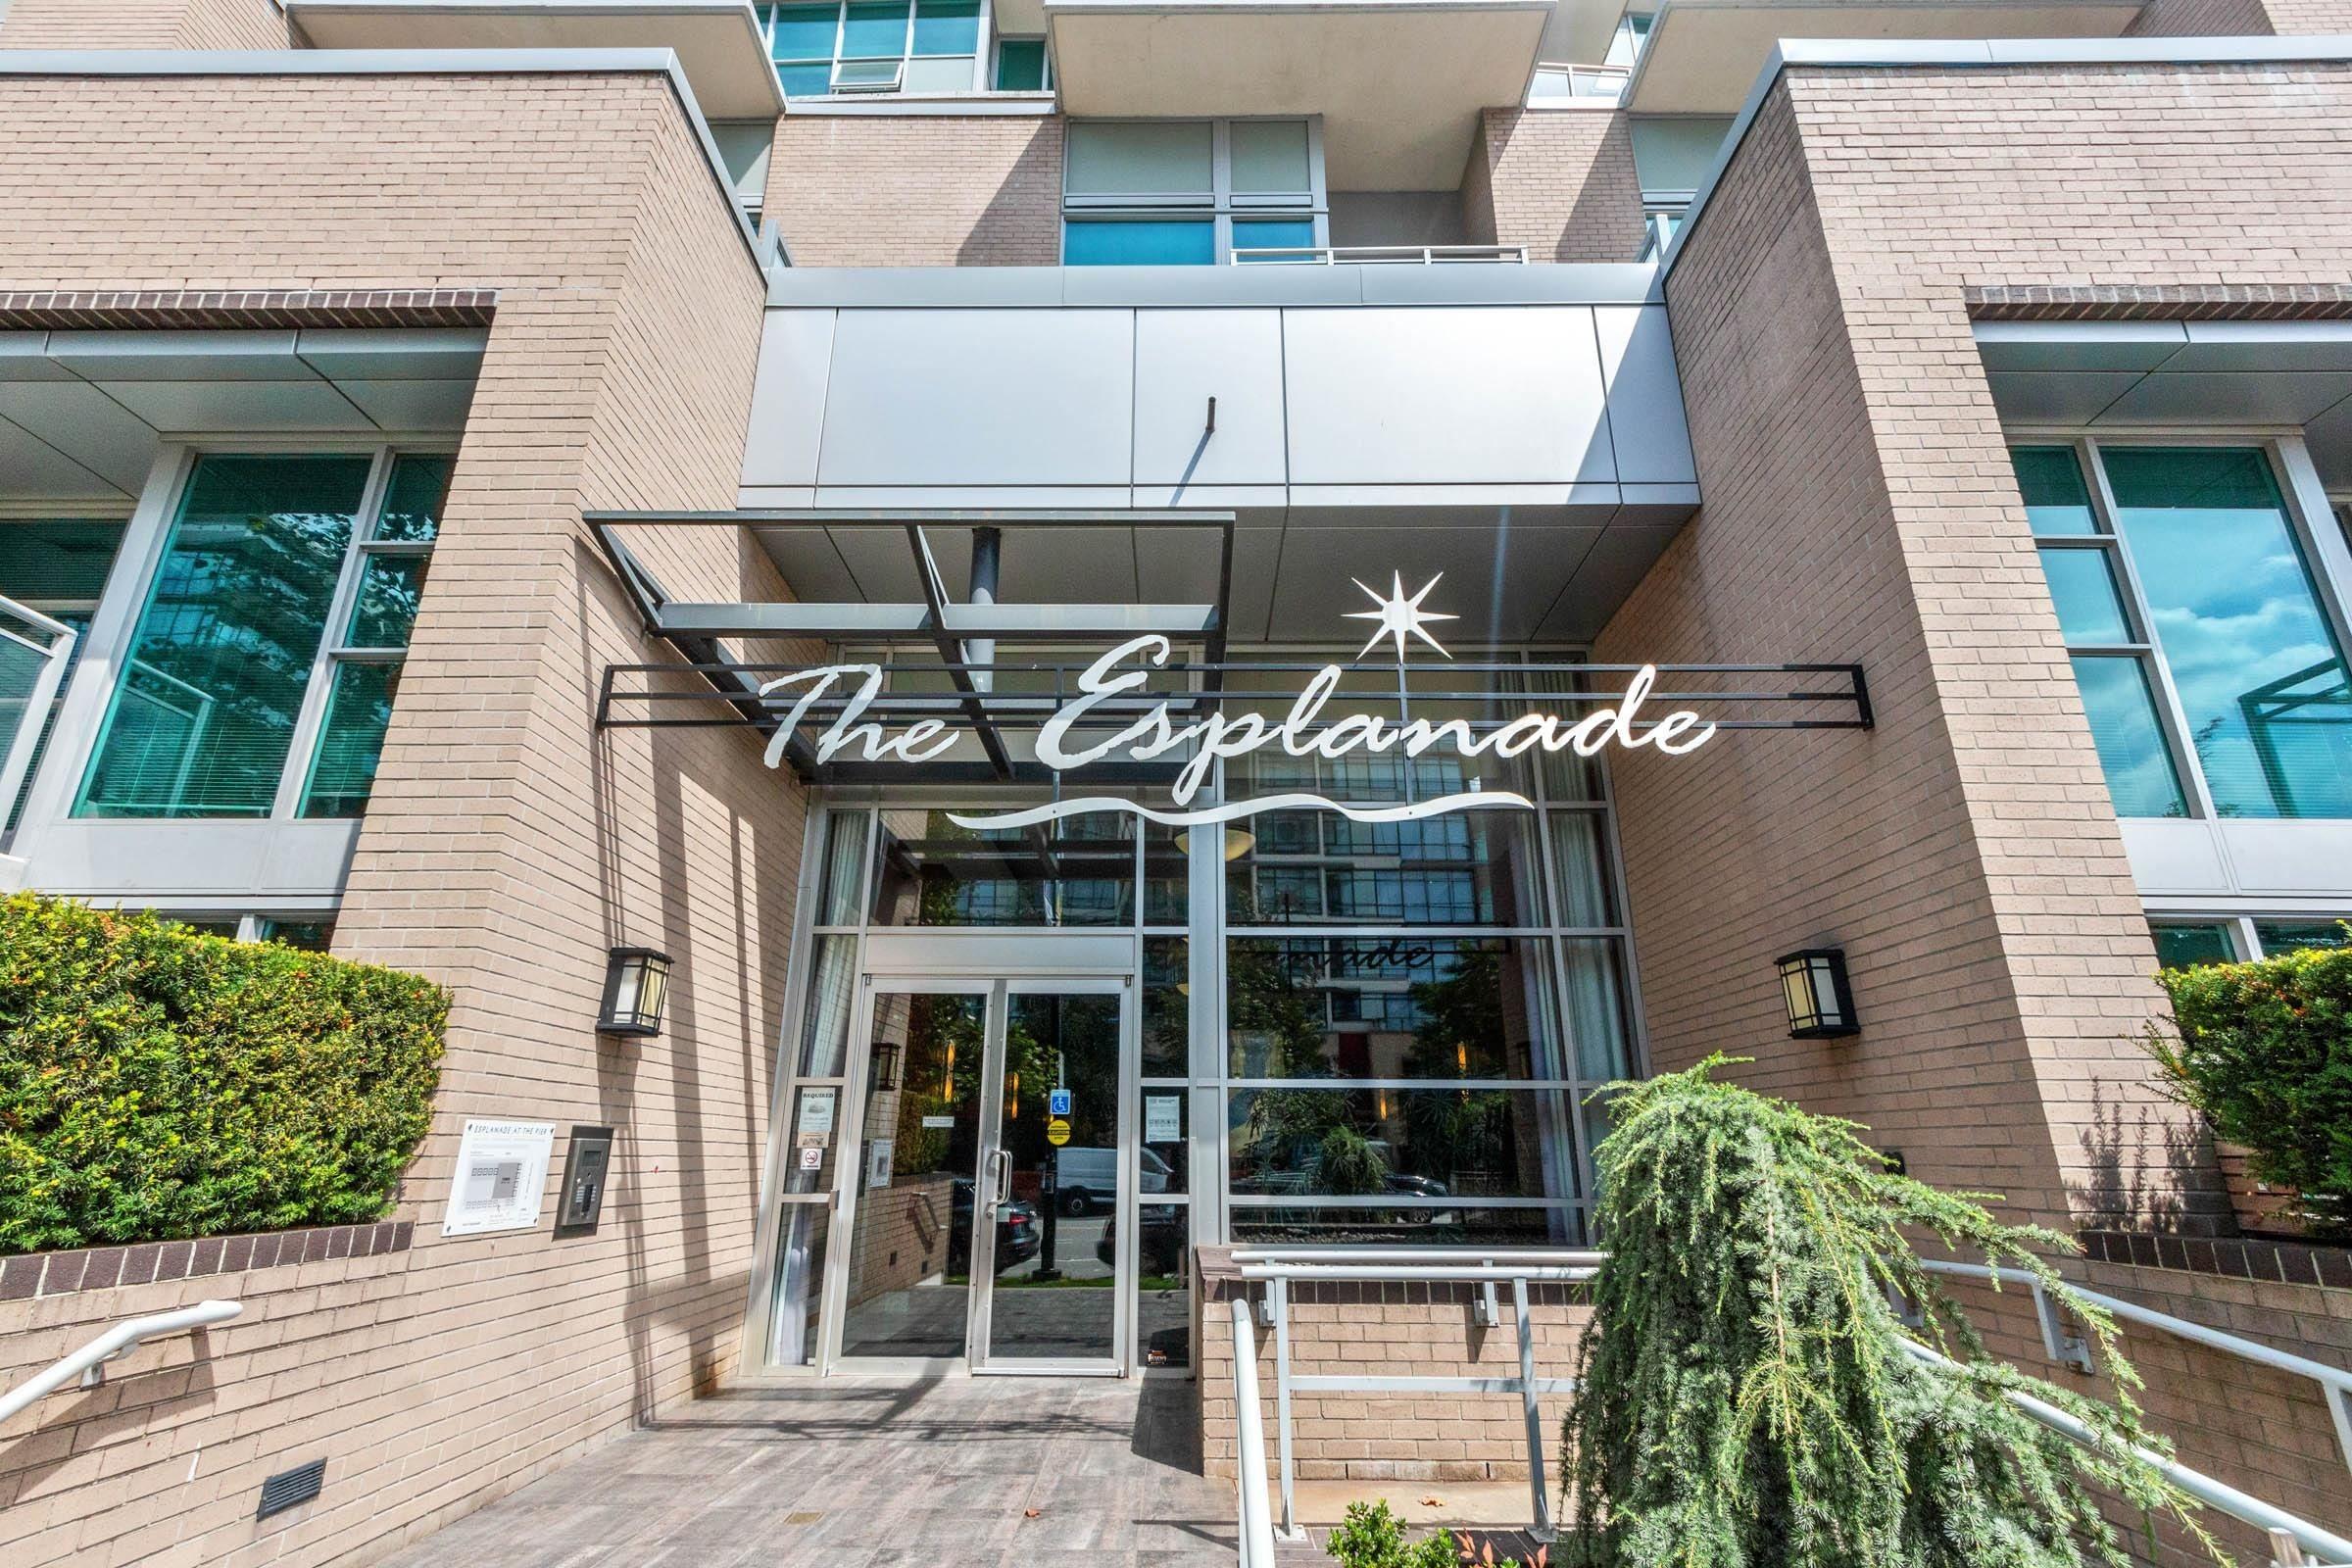 1803 188 E ESPLANADE AVENUE - Lower Lonsdale Apartment/Condo for sale, 2 Bedrooms (R2617573) - #1